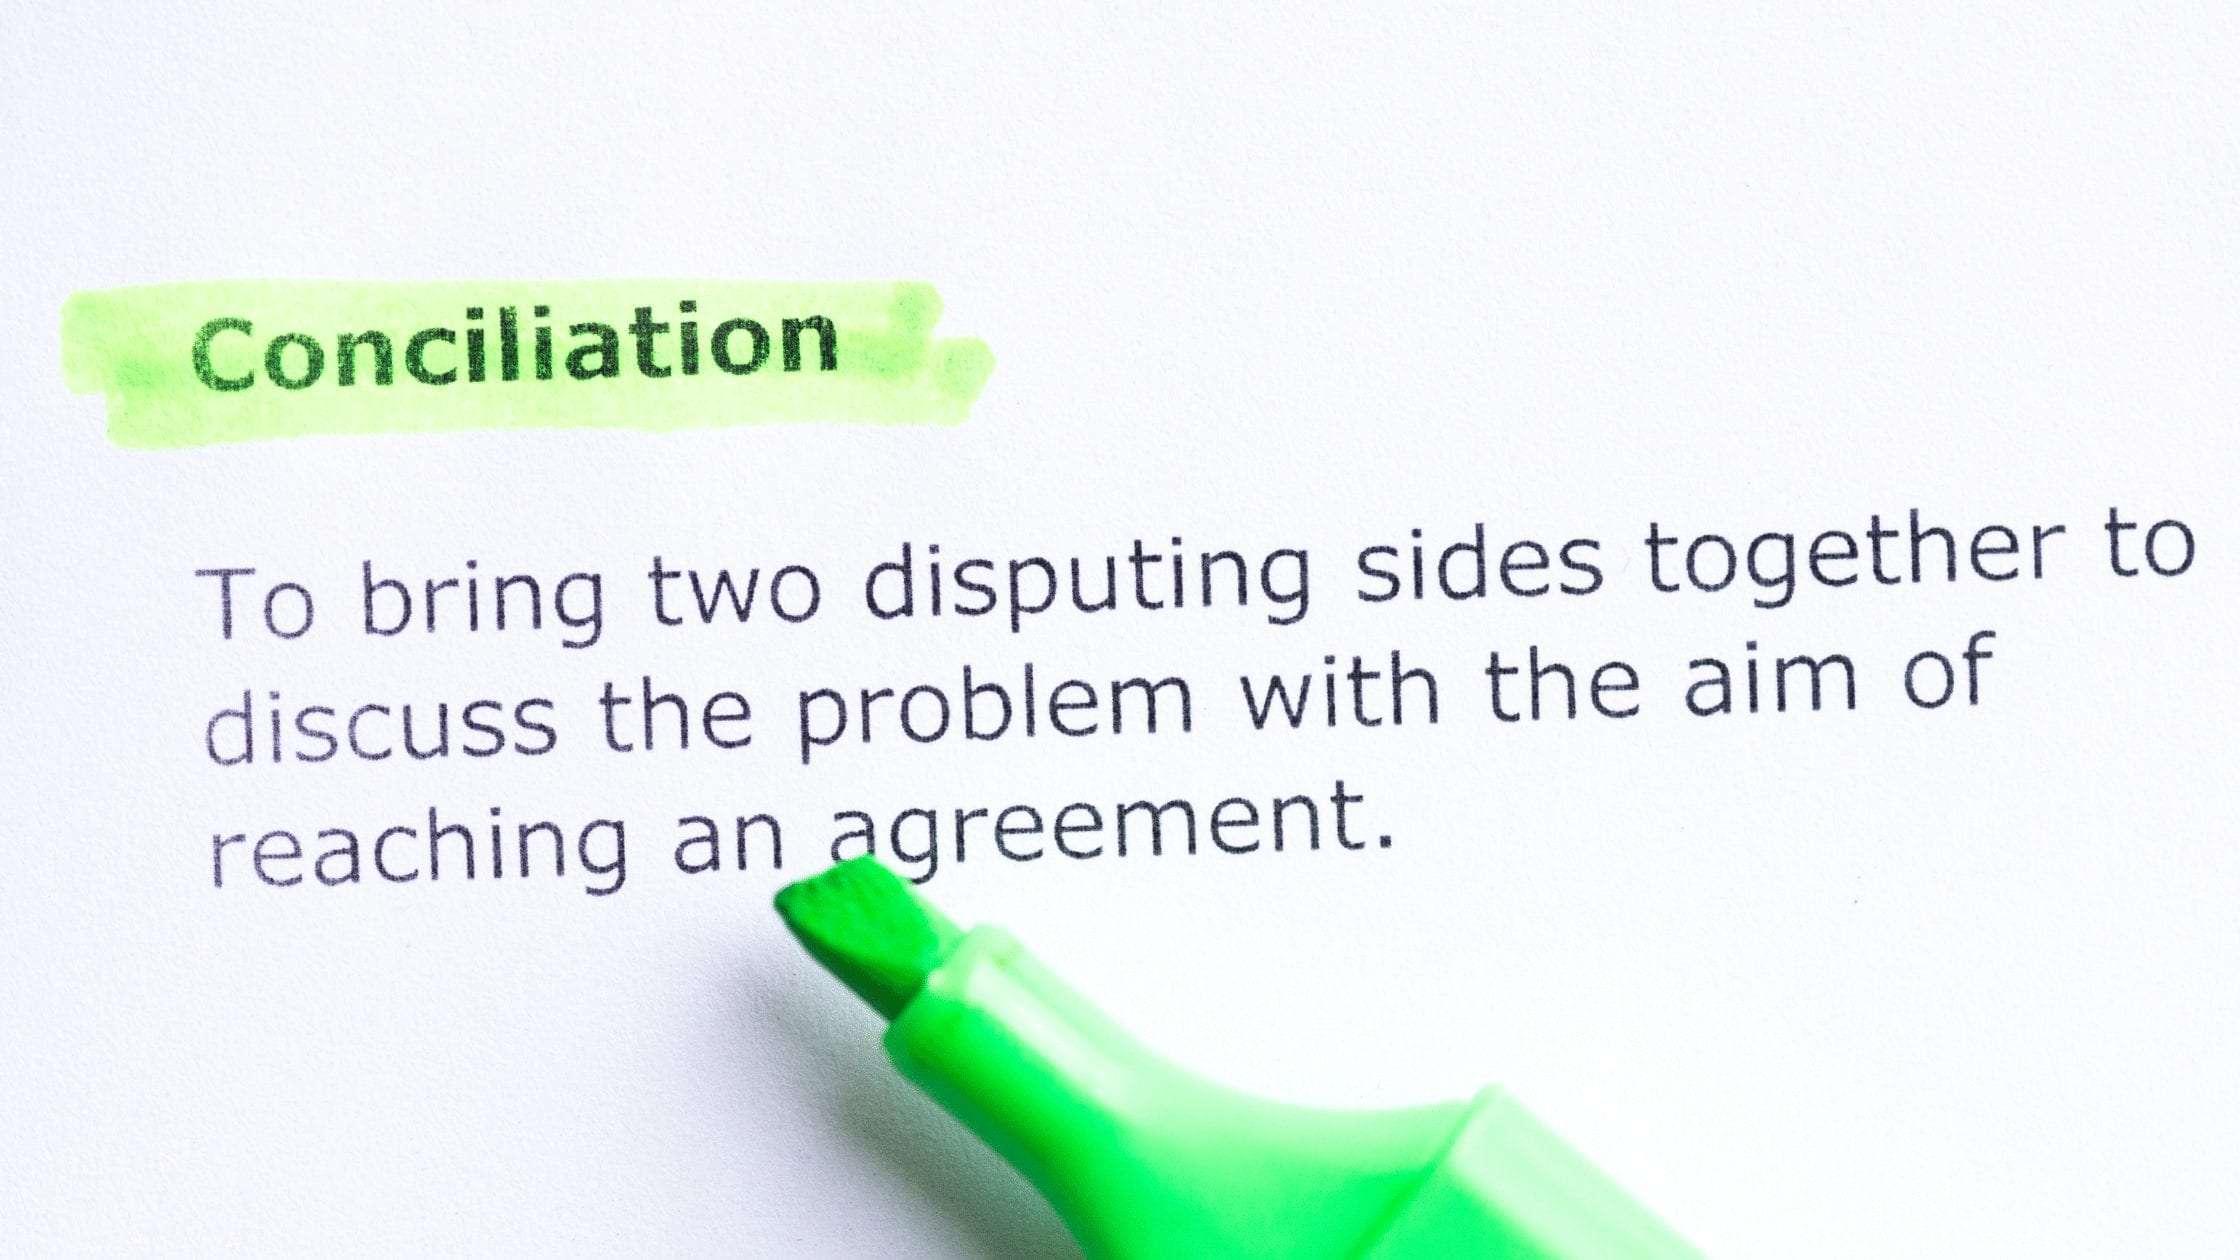 Process of Conciliation